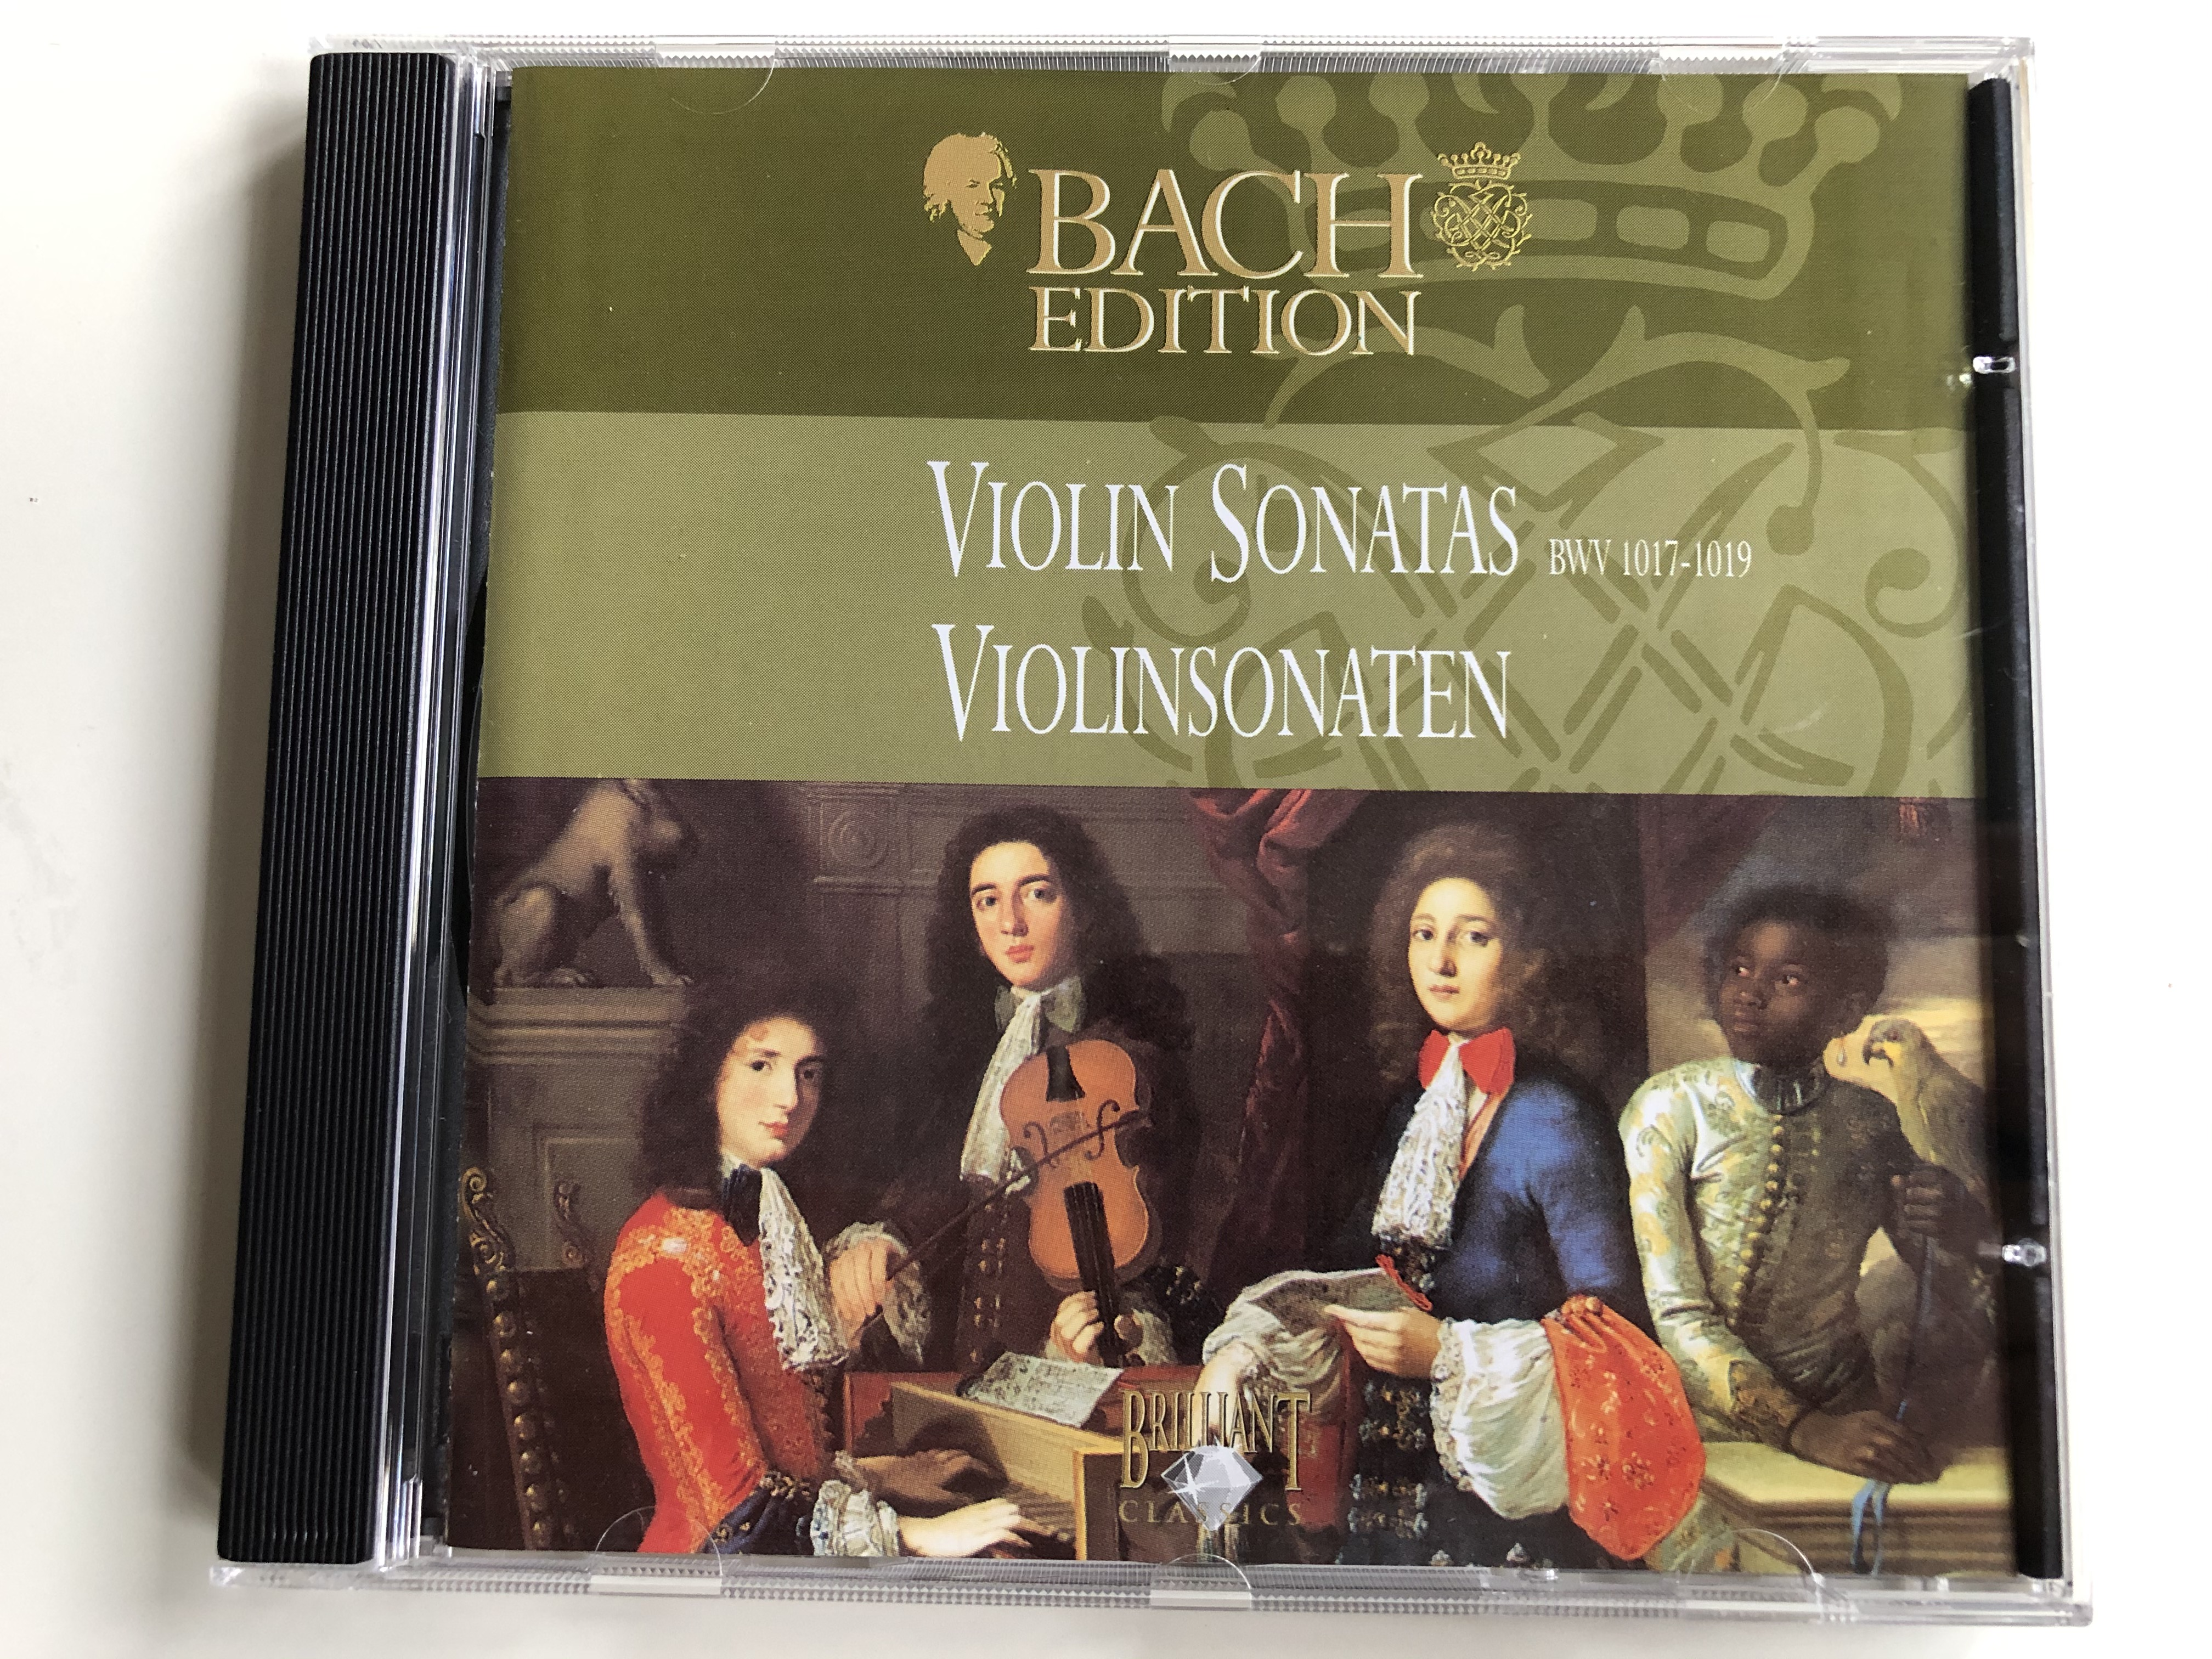 bach-edition-violin-sonatas-bwv-1017-1019-violinsonaten-brilliant-classics-audio-cd-9937512-1-.jpg